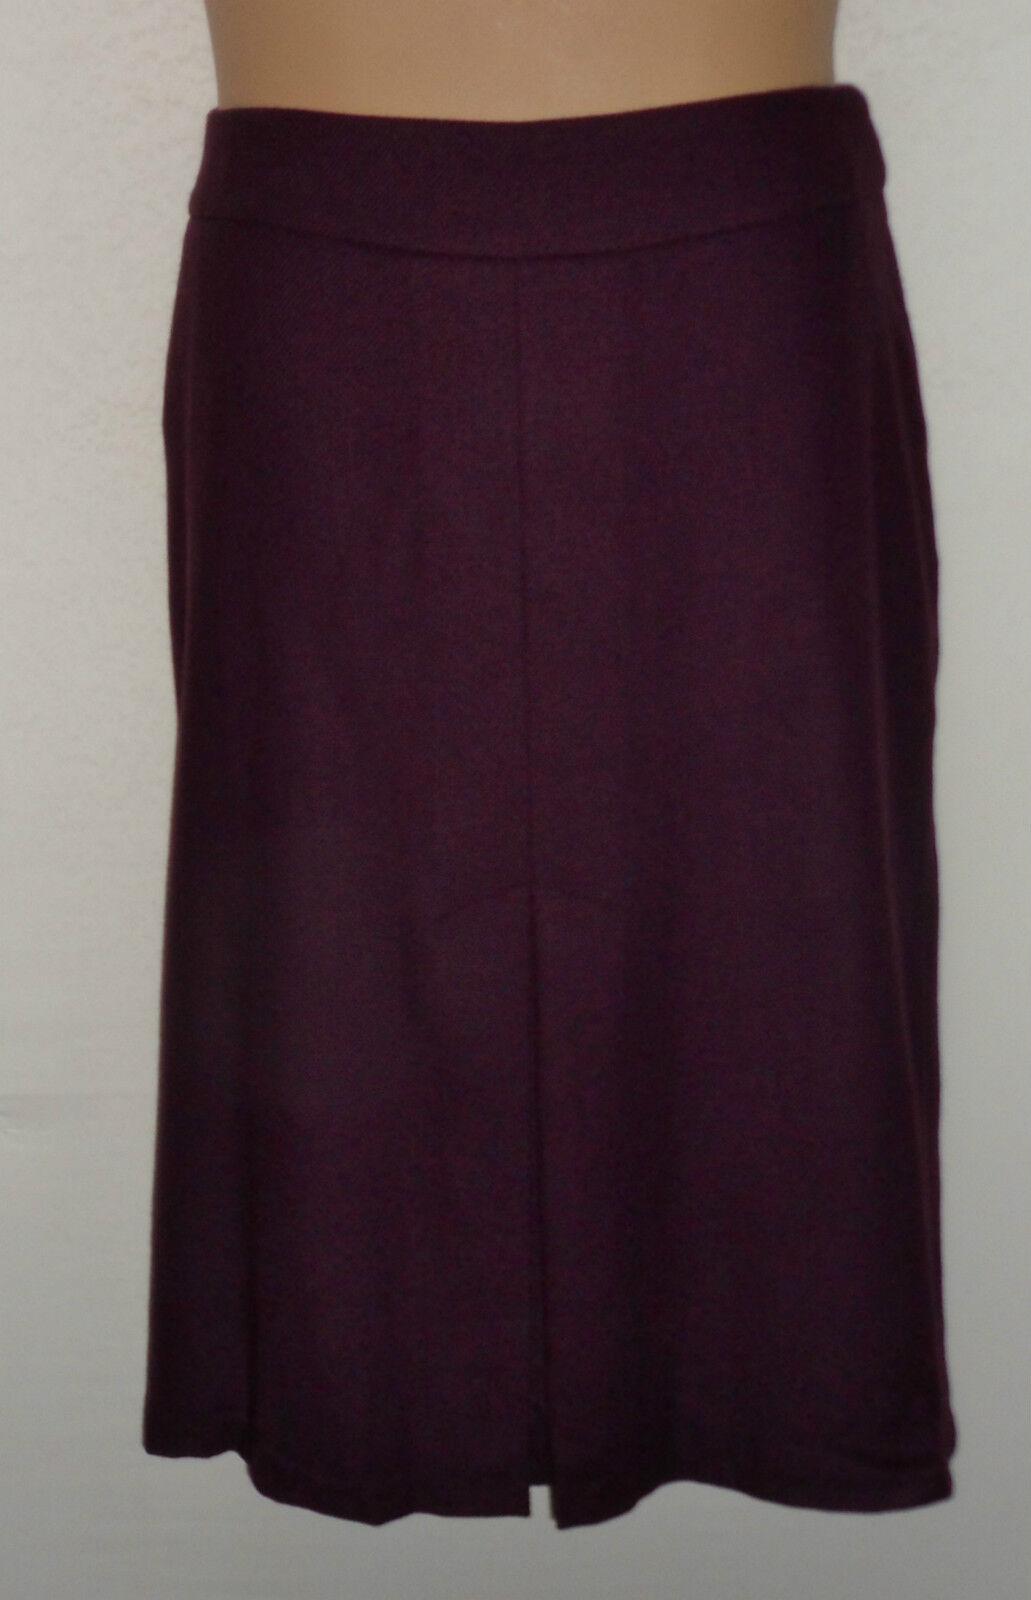 EAST wool mix skirt more like an 18 US 16